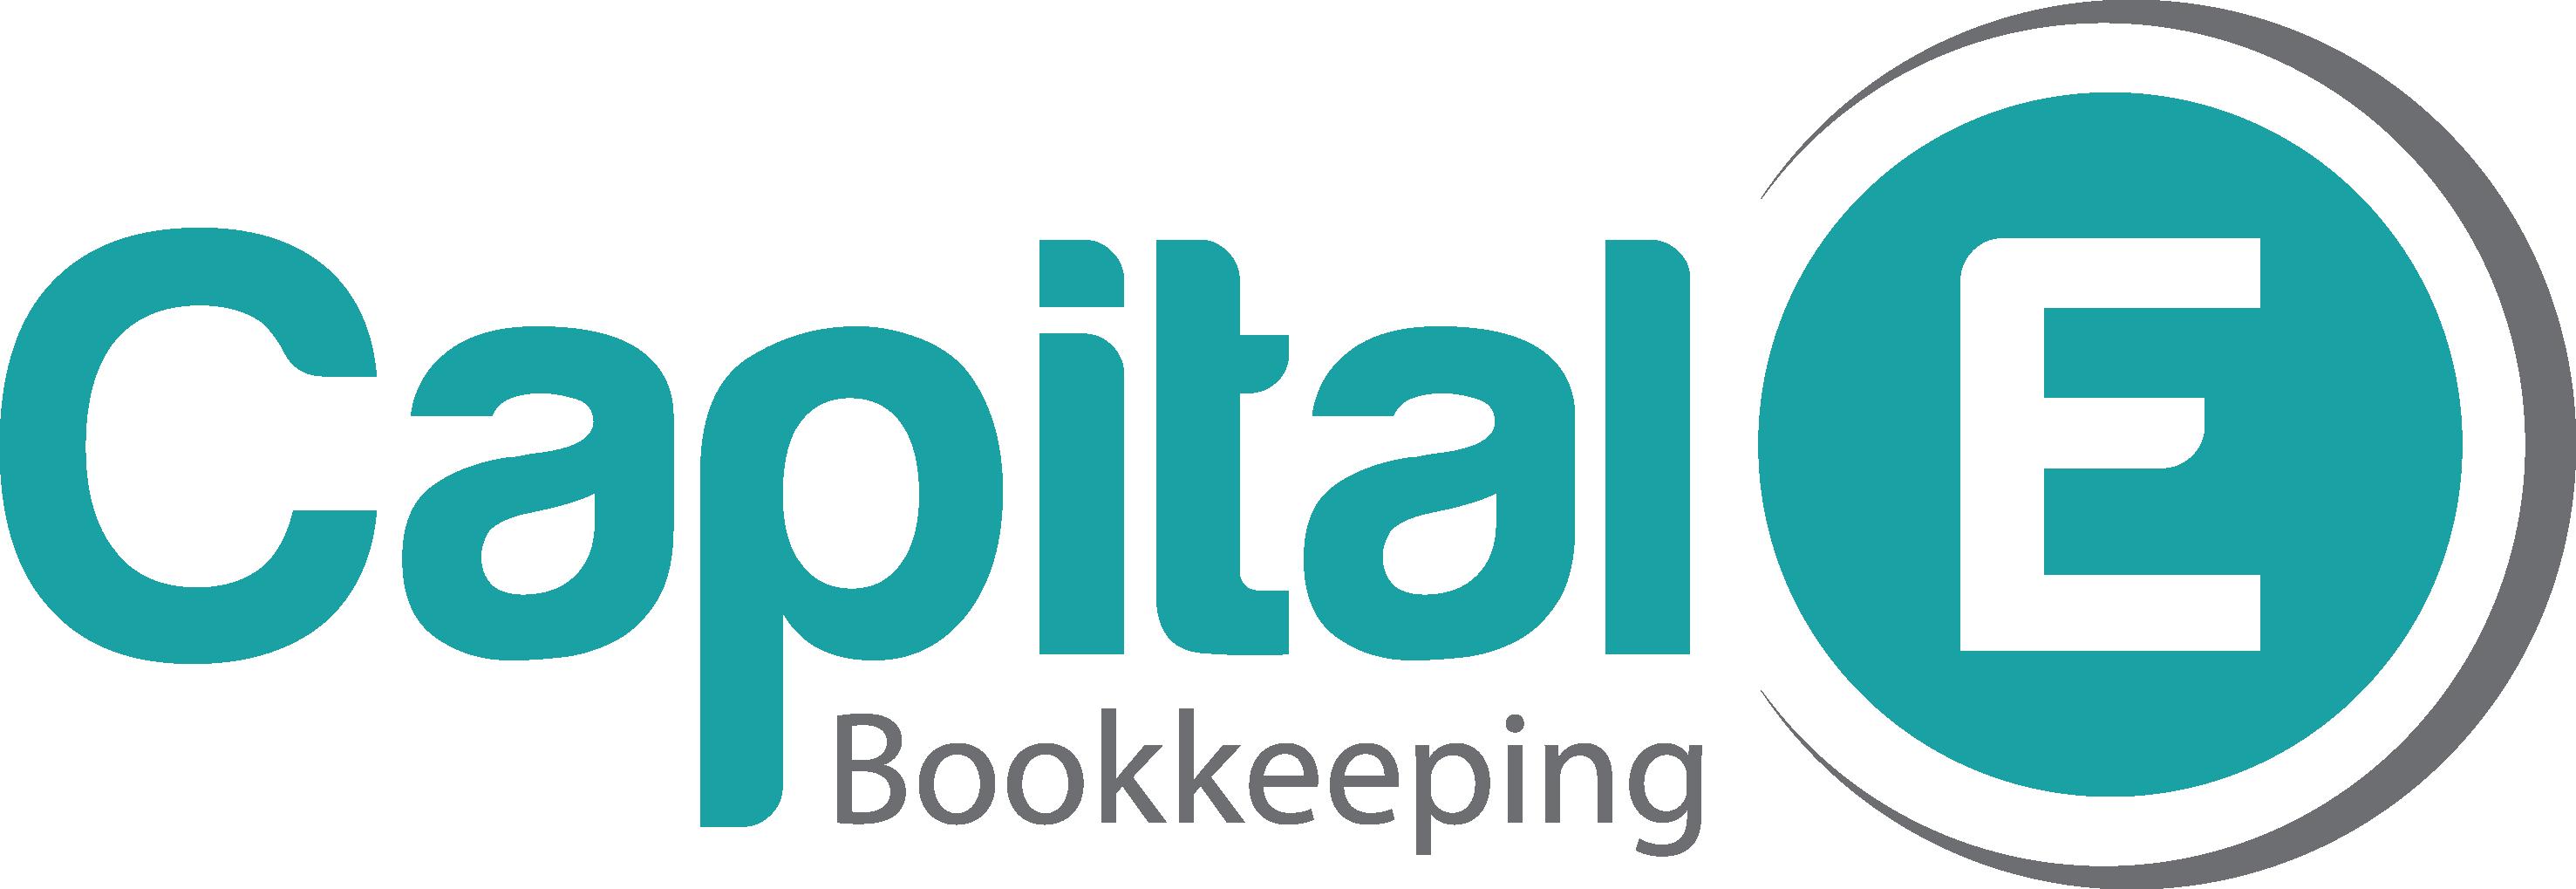 Capital E Bookkeeping